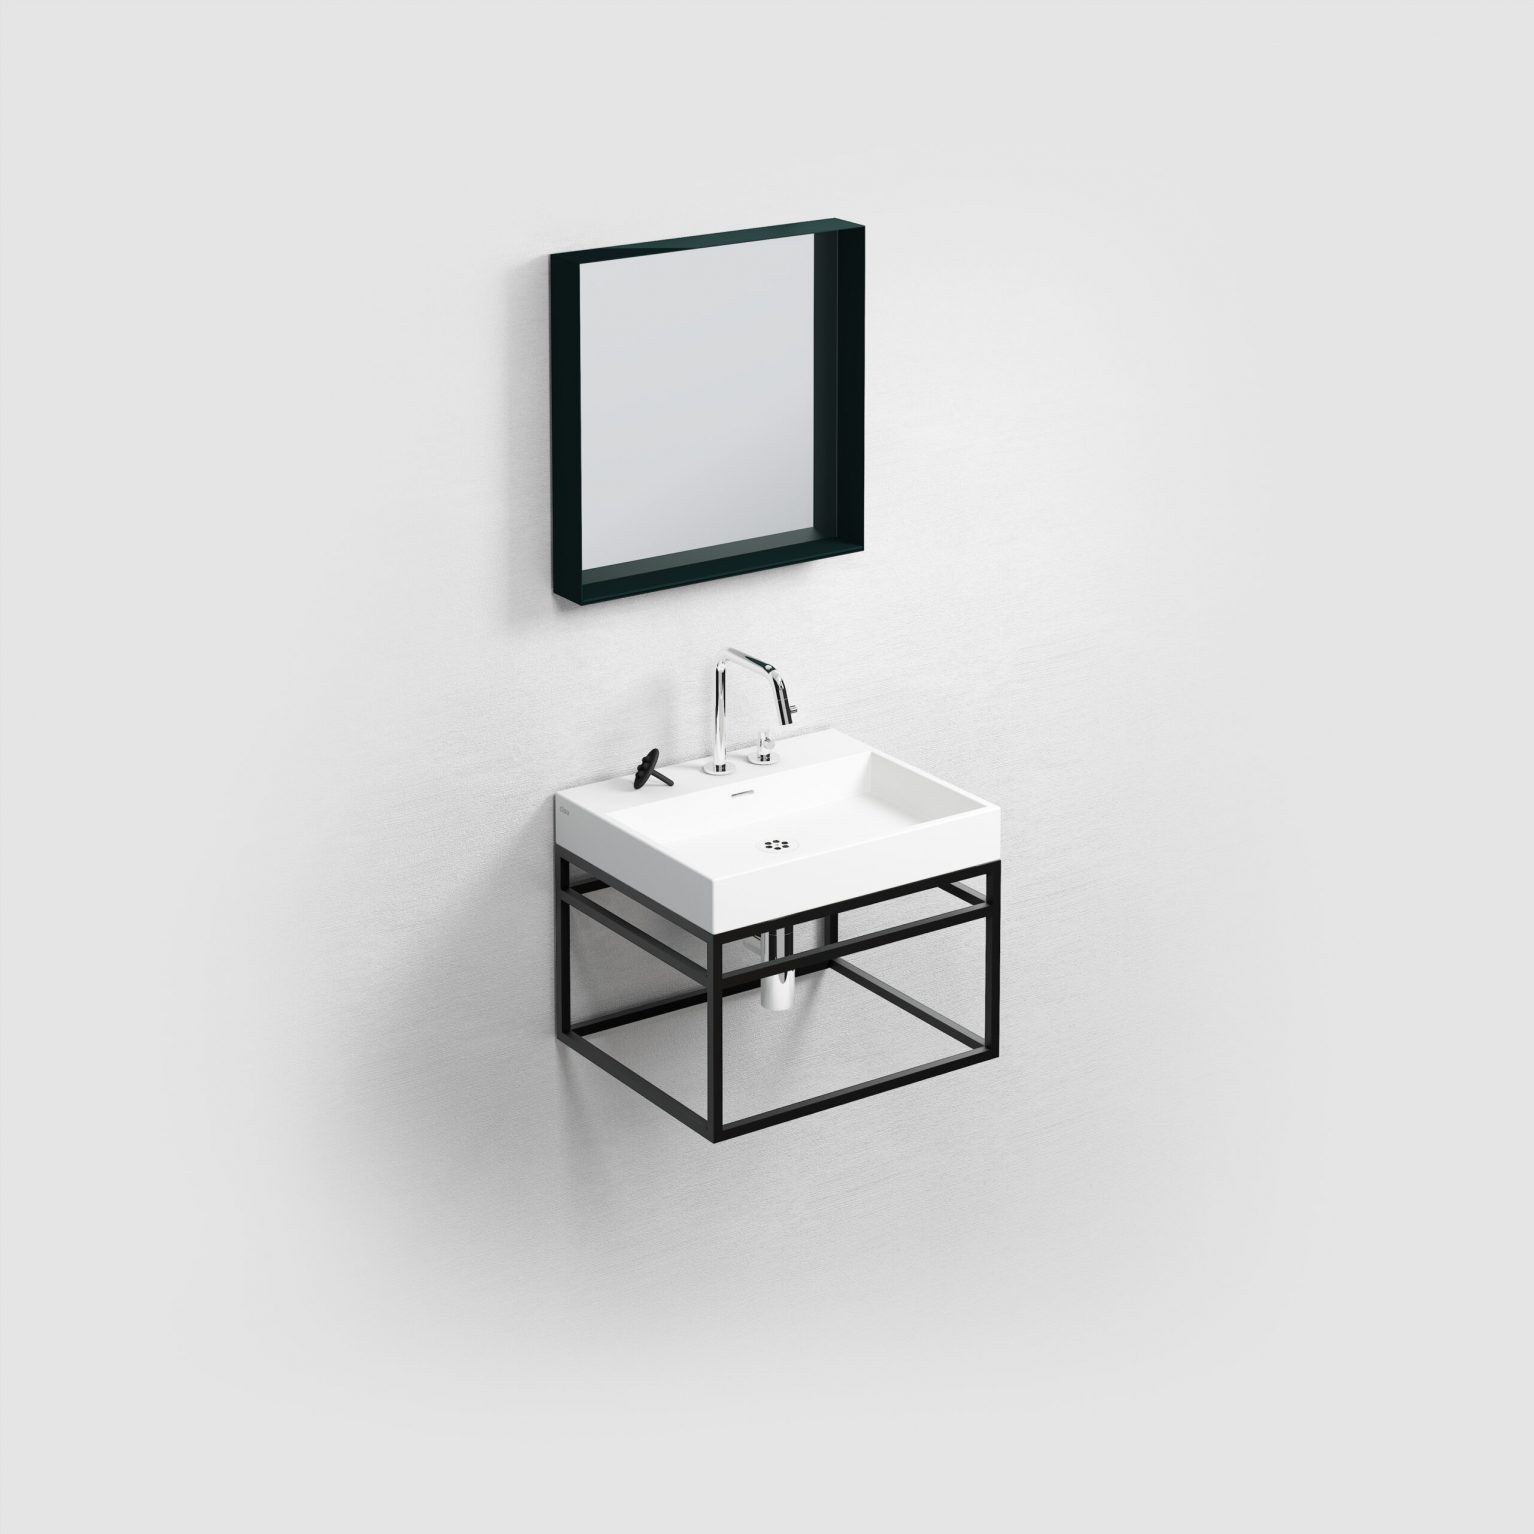 (New) Wash Me Frame rvs kokerprof. 50 cm mat zwart poederlak)